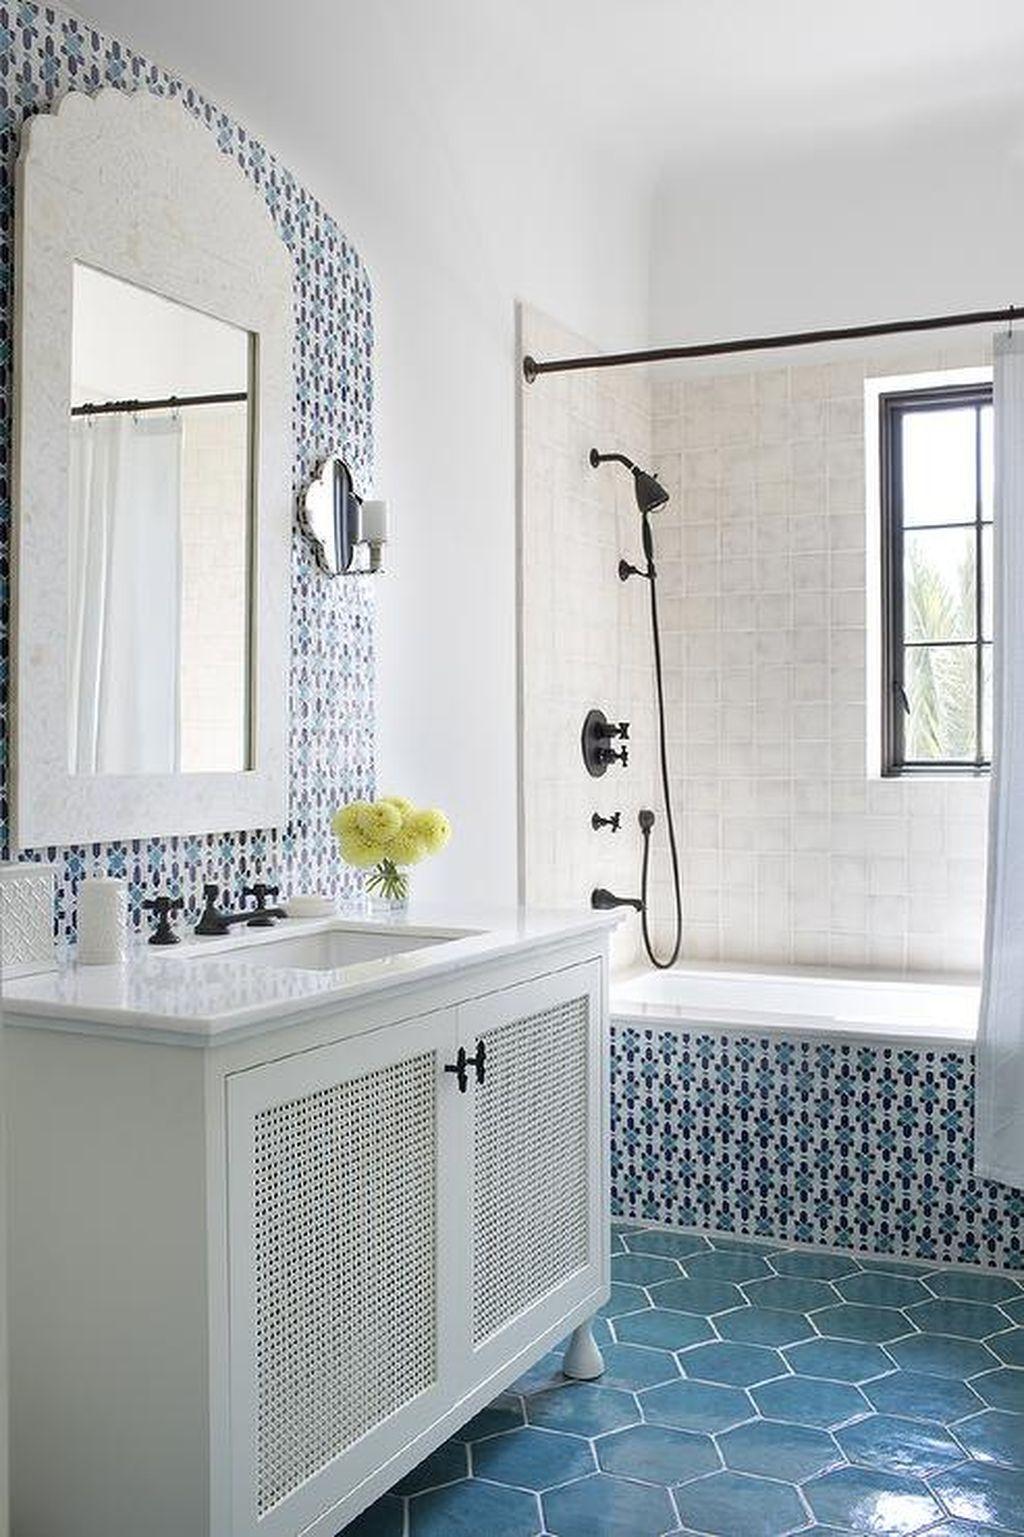 36 Cool Must Try Makeup Hacks: 36 Cool Blue Bathroom Design Ideas 36